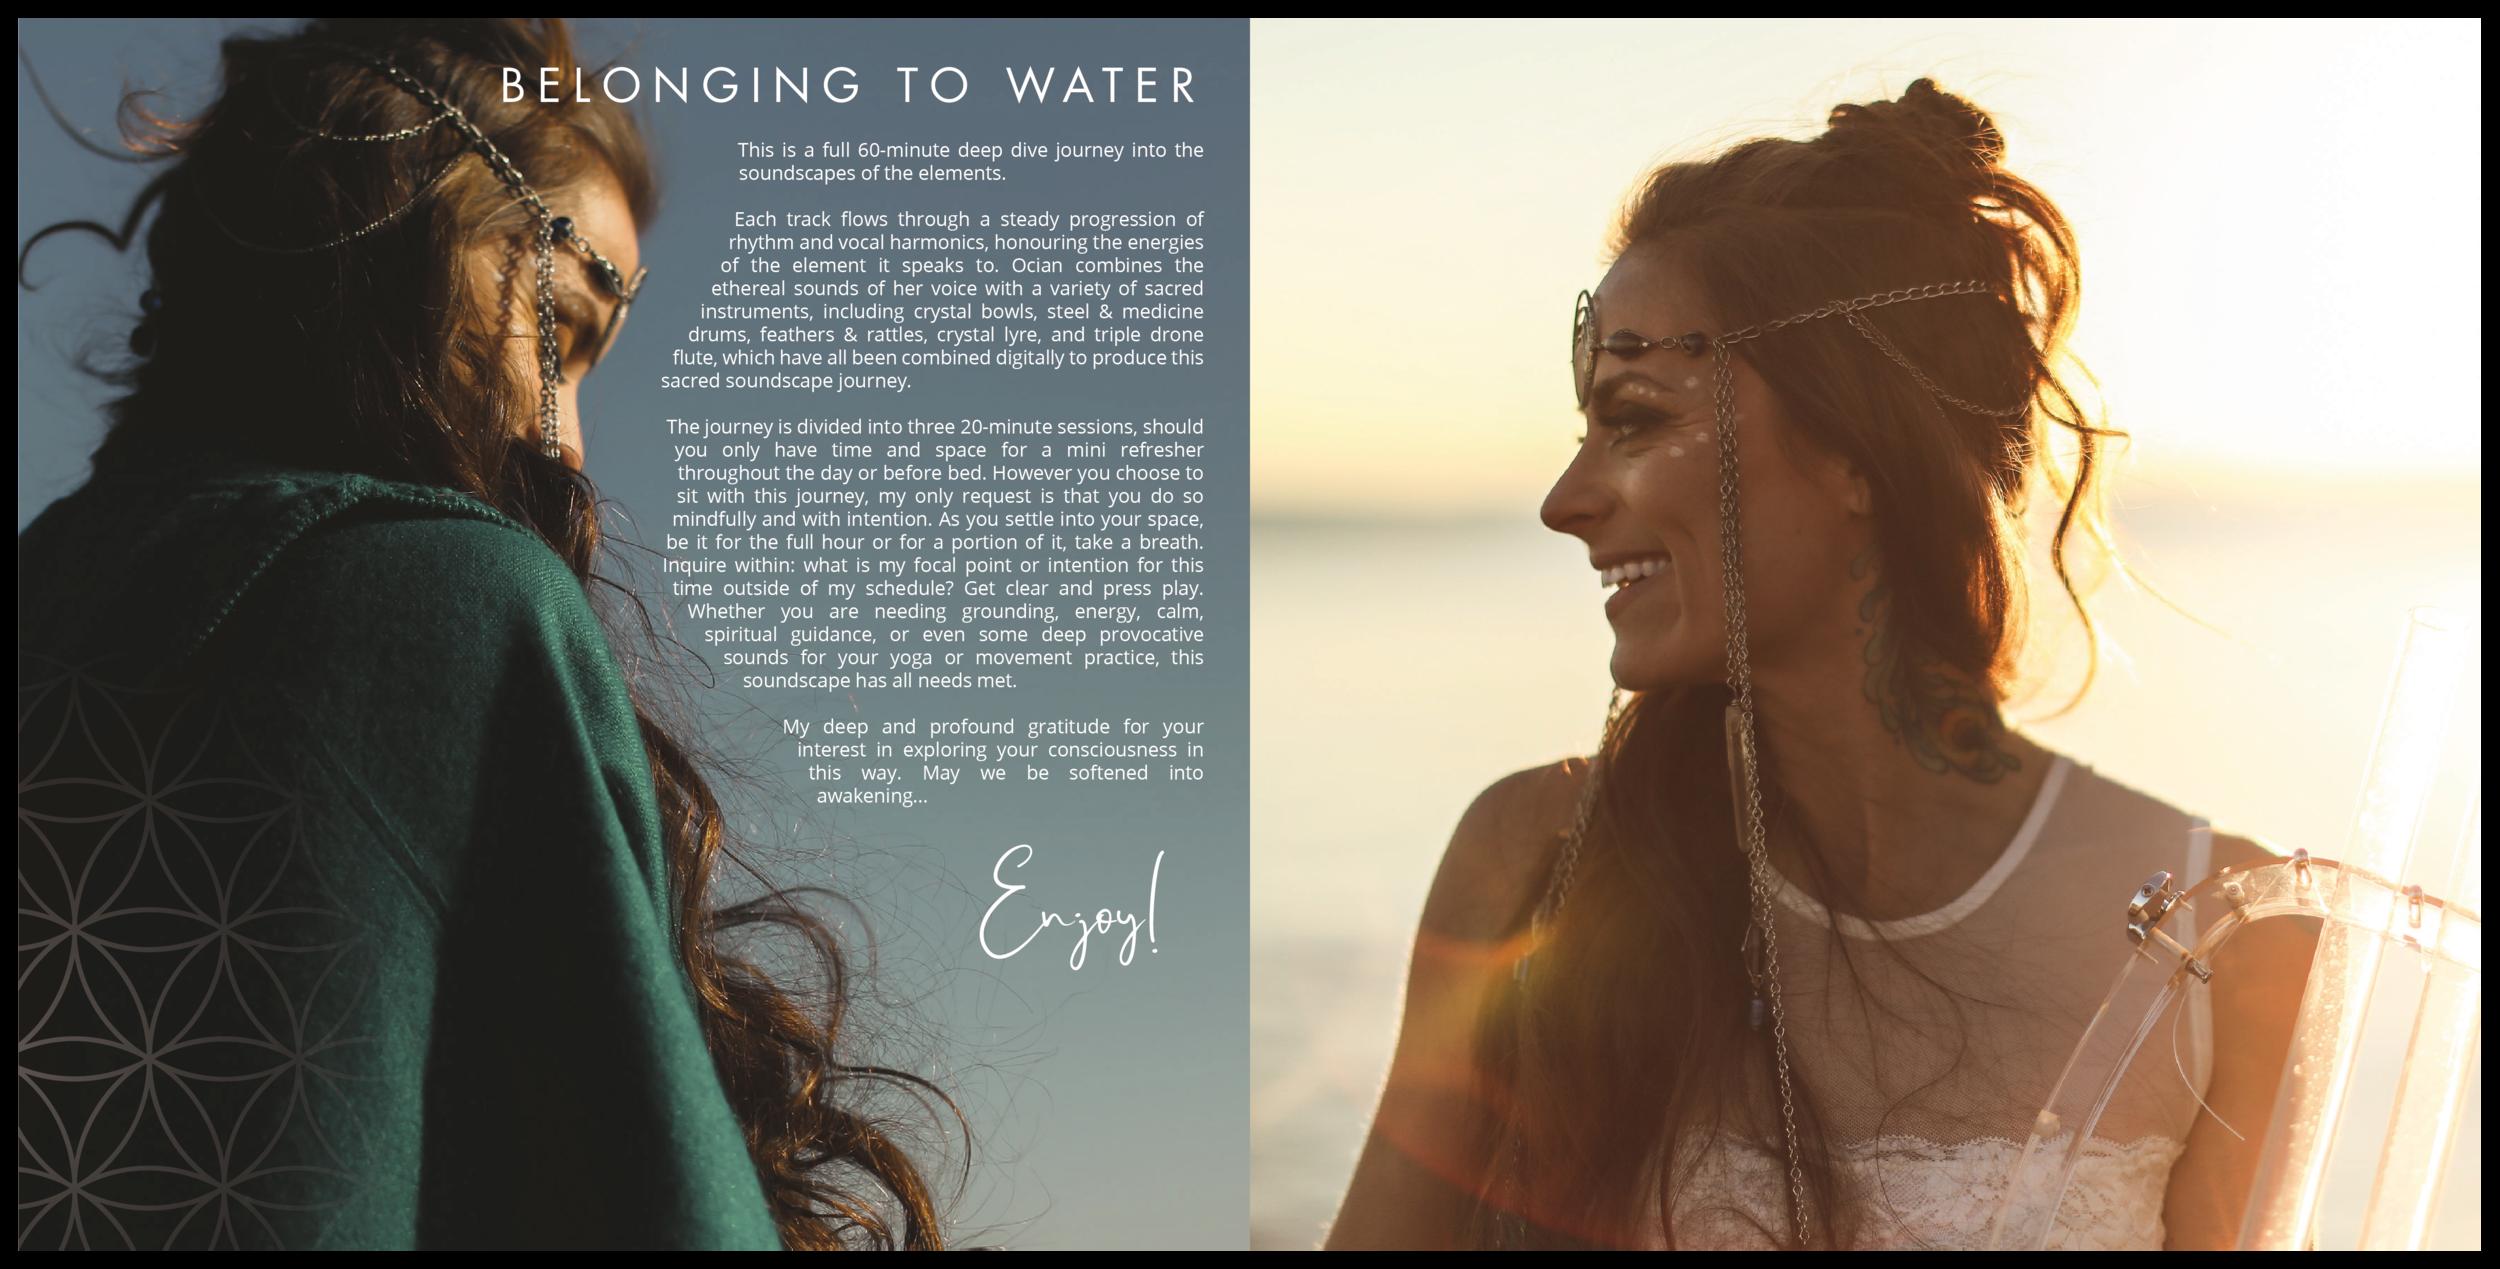 Ocian-Sound_Belonging-To-Water_Artwork-03.png